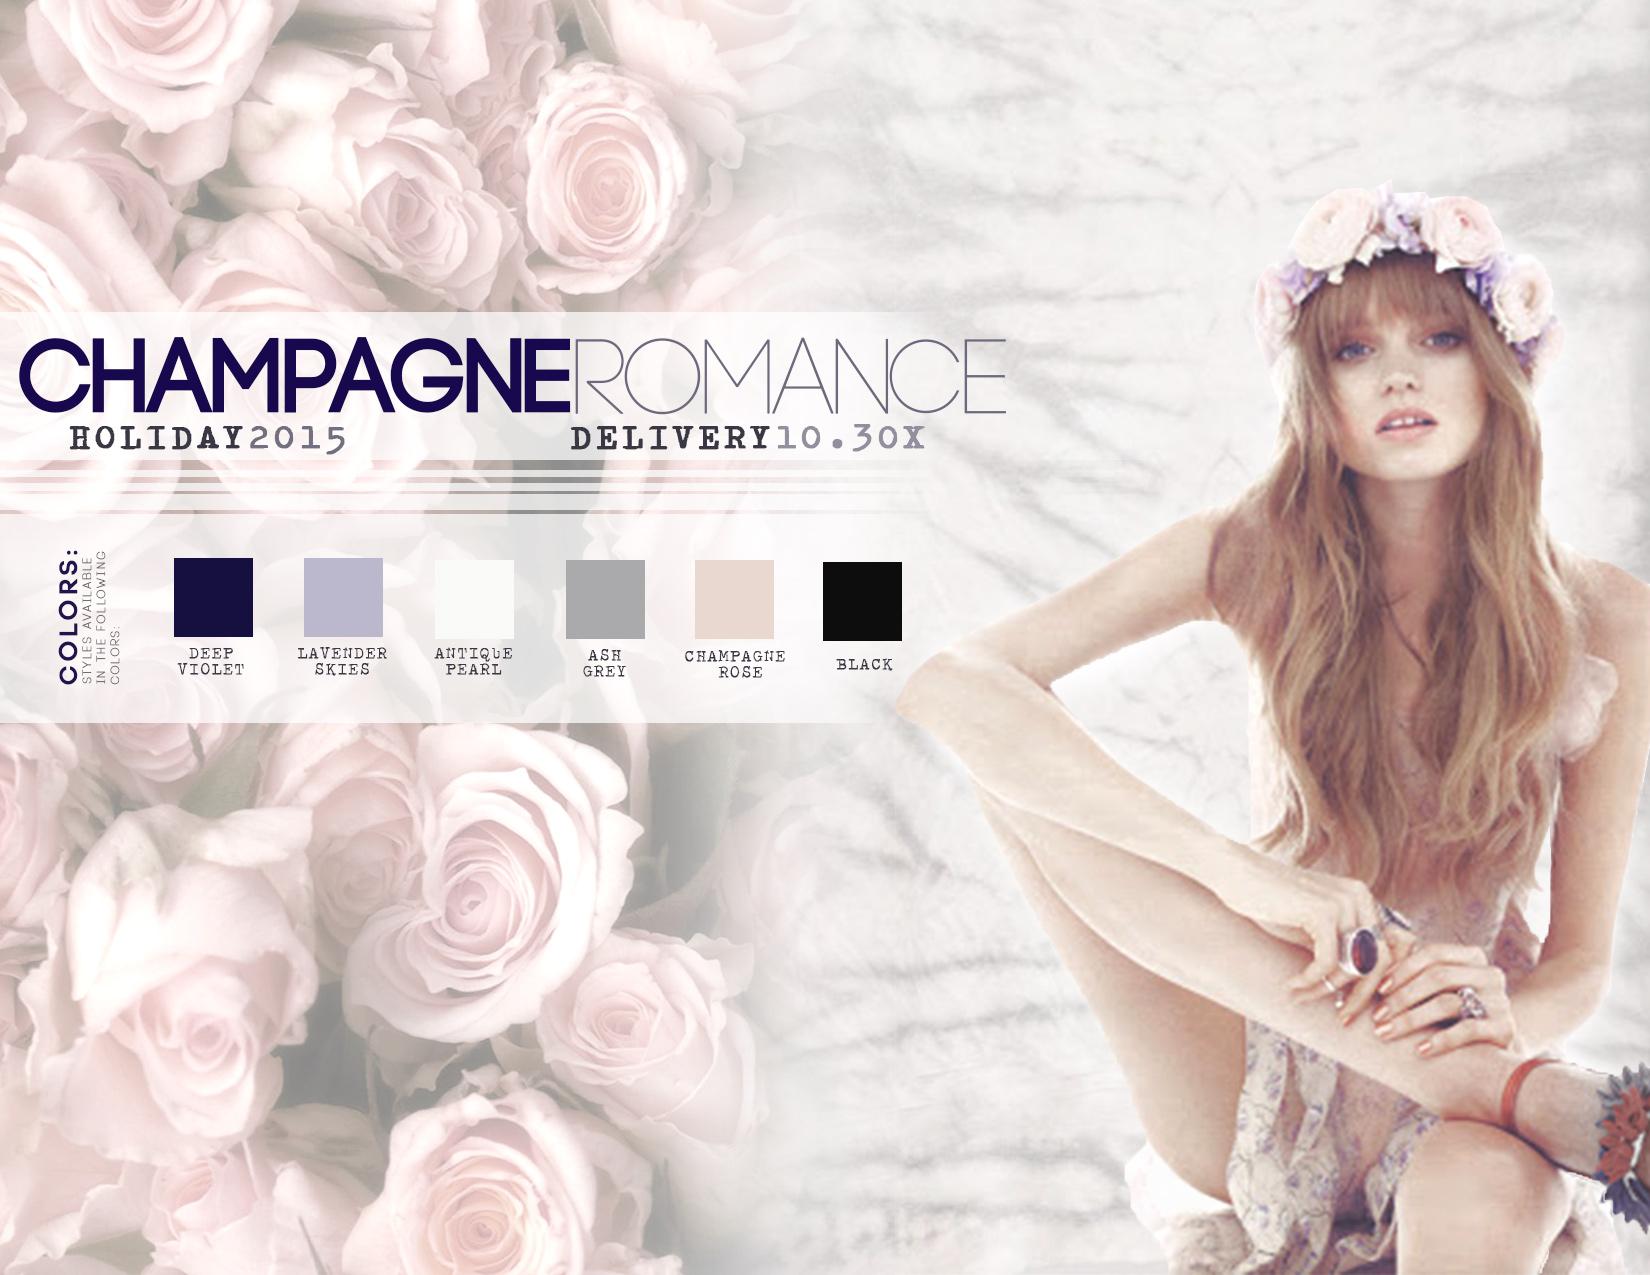 champagne-romance-10-30-holiday-2015.jpg